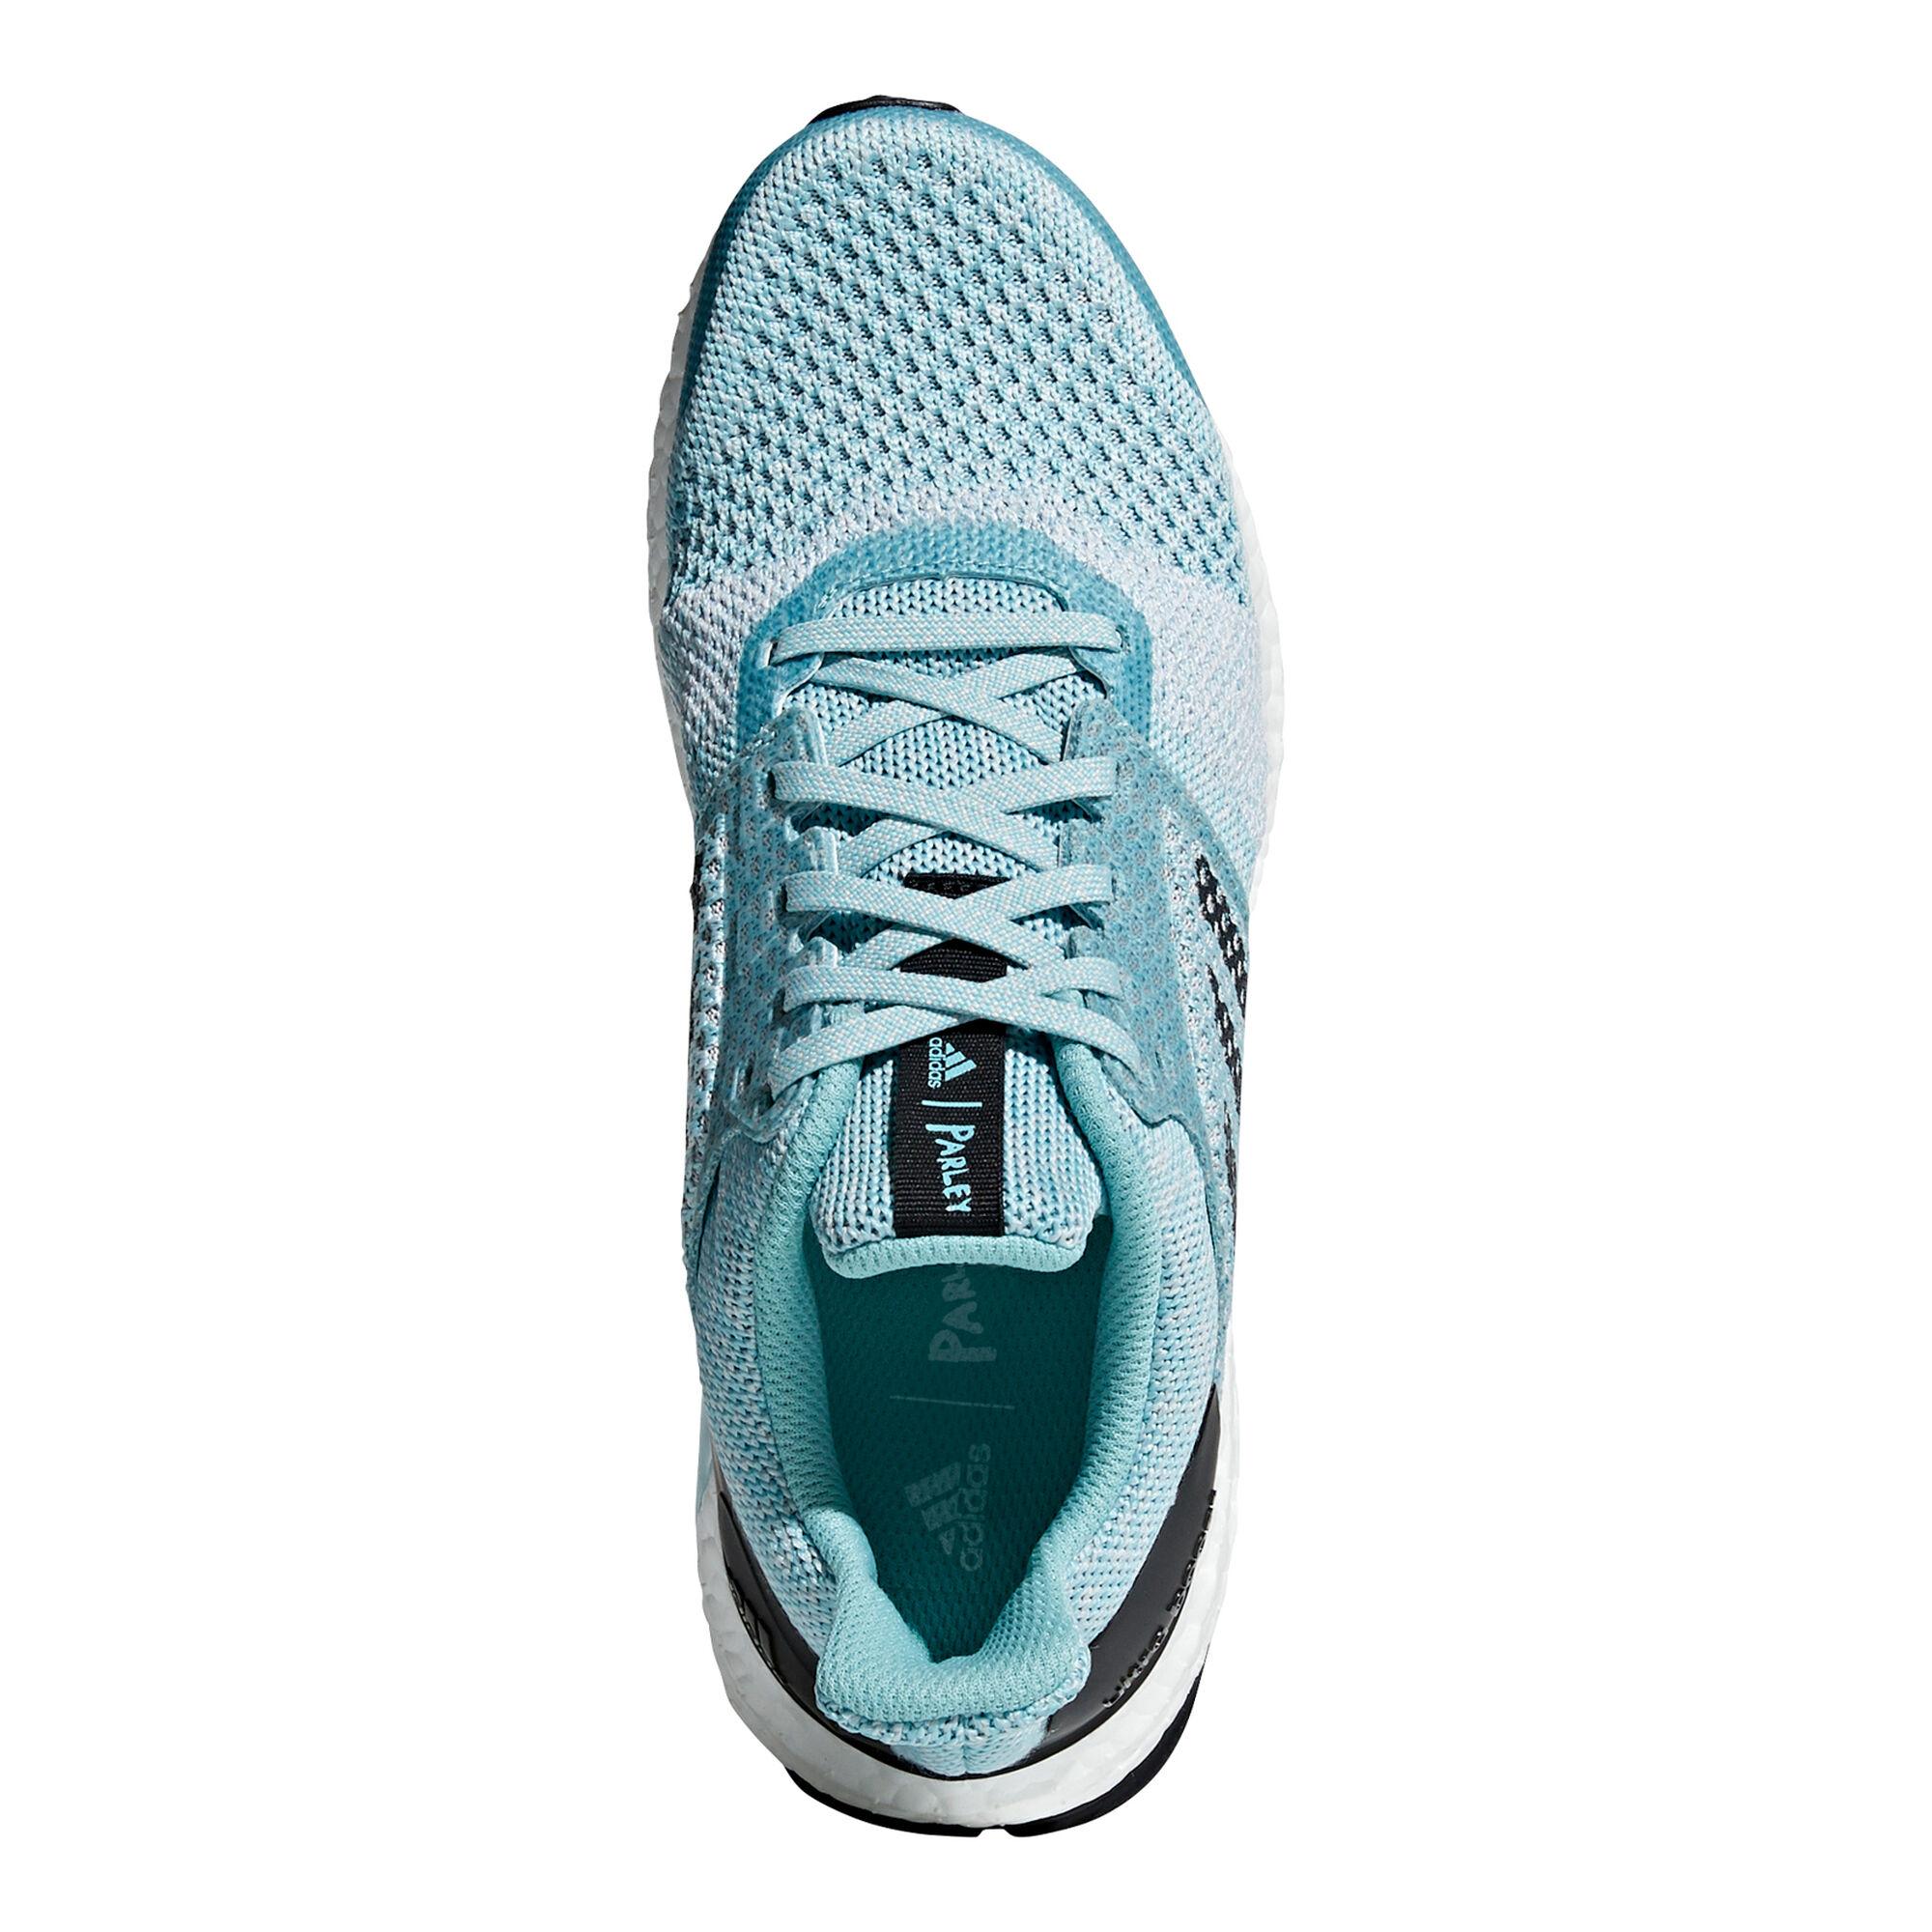 reputable site 42de4 34829 adidas adidas adidas adidas adidas adidas adidas adidas adidas. Ultra  Boost ST Parley ...